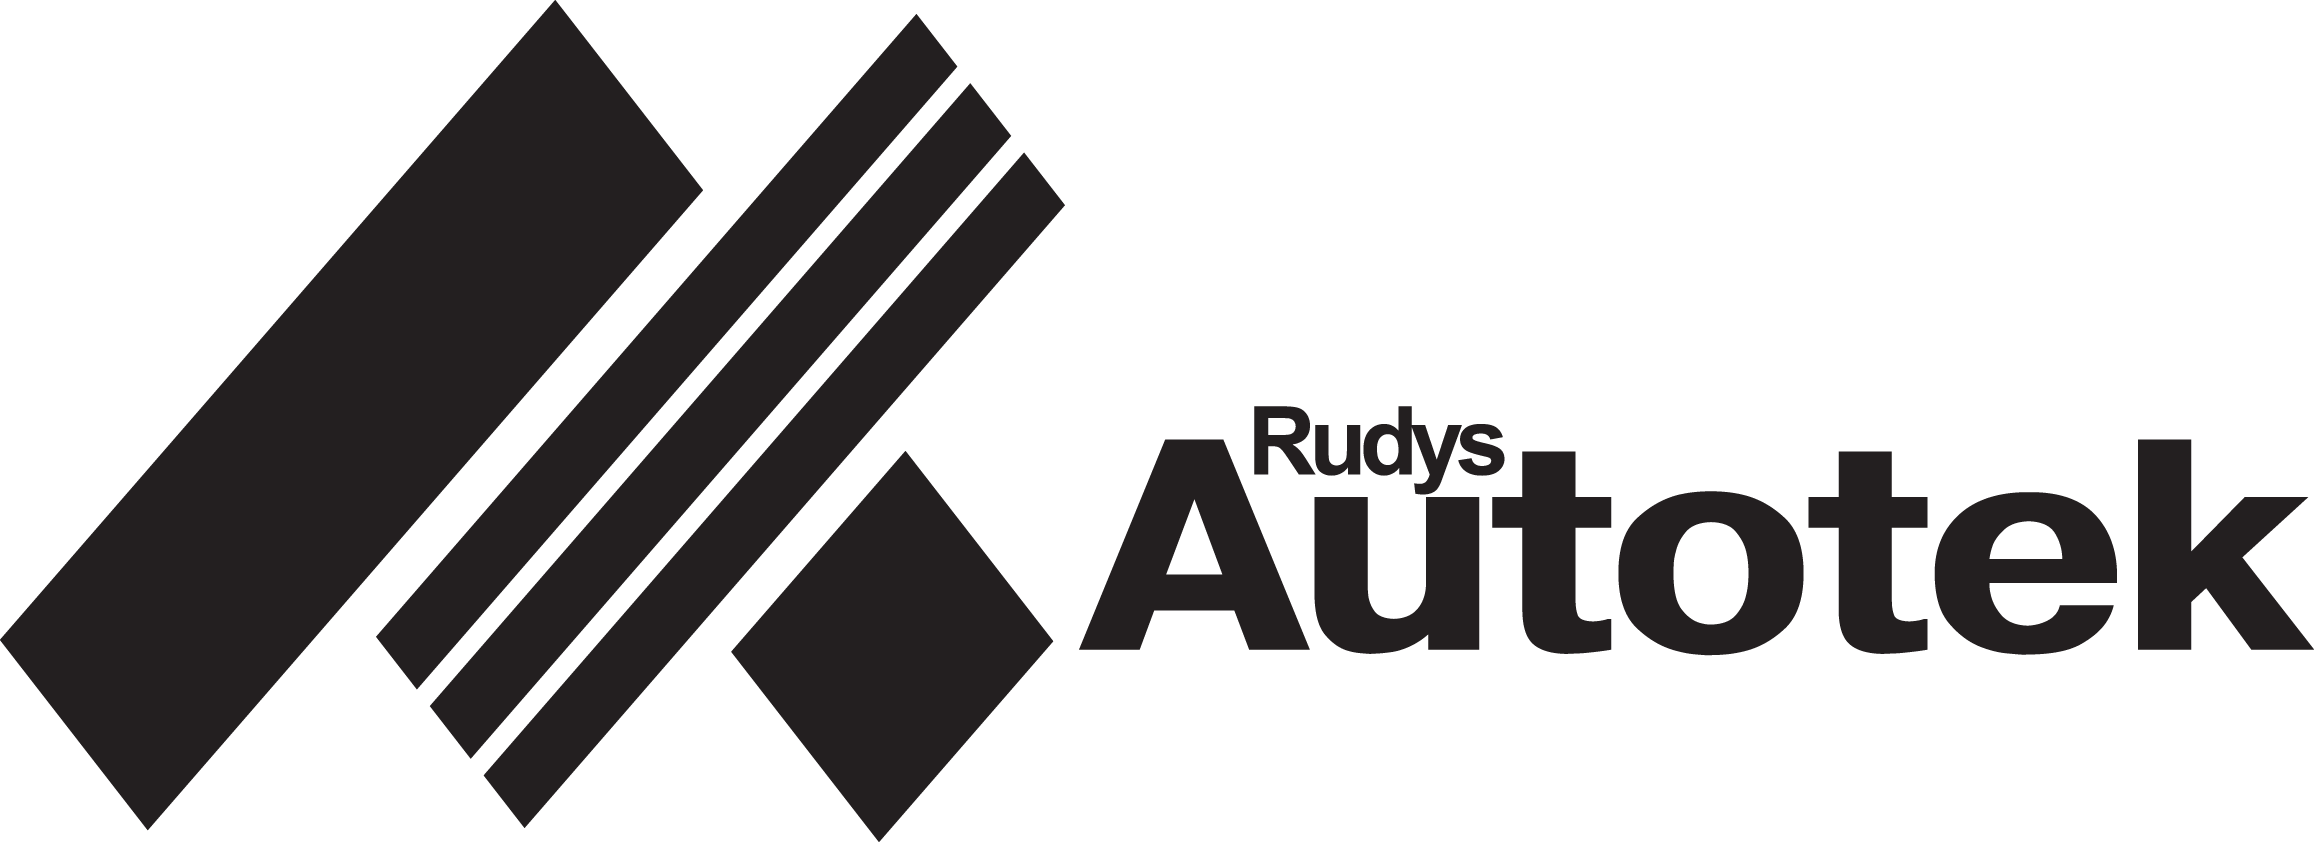 Rudys Autotek